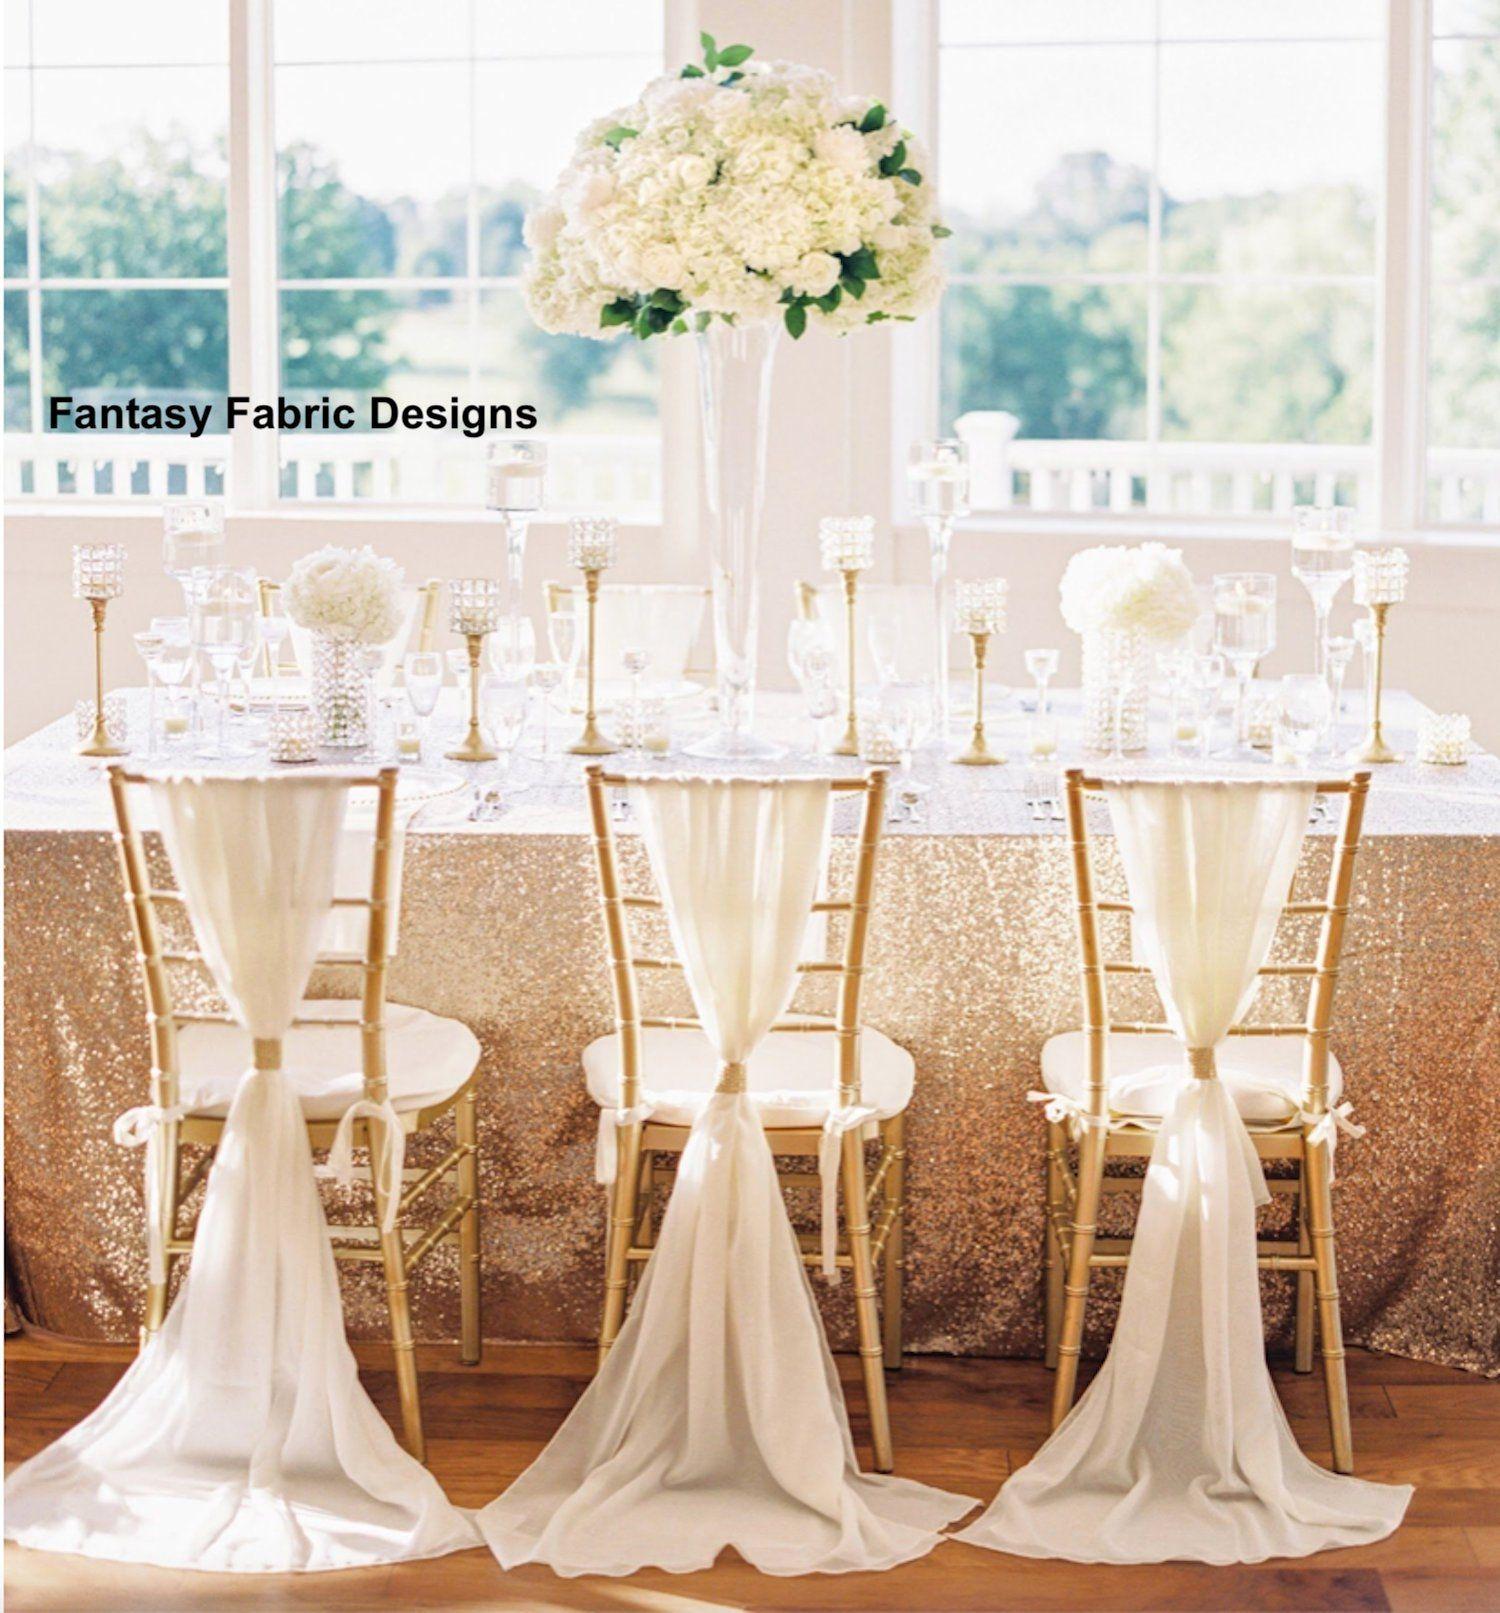 Sale 50 Chair Sash Wedding Decor Wedding Chair Covers Chair Sash Chiffon Chair Sash Wedding Chai Wedding Chair Sashes Chair Covers Wedding Wedding Chairs